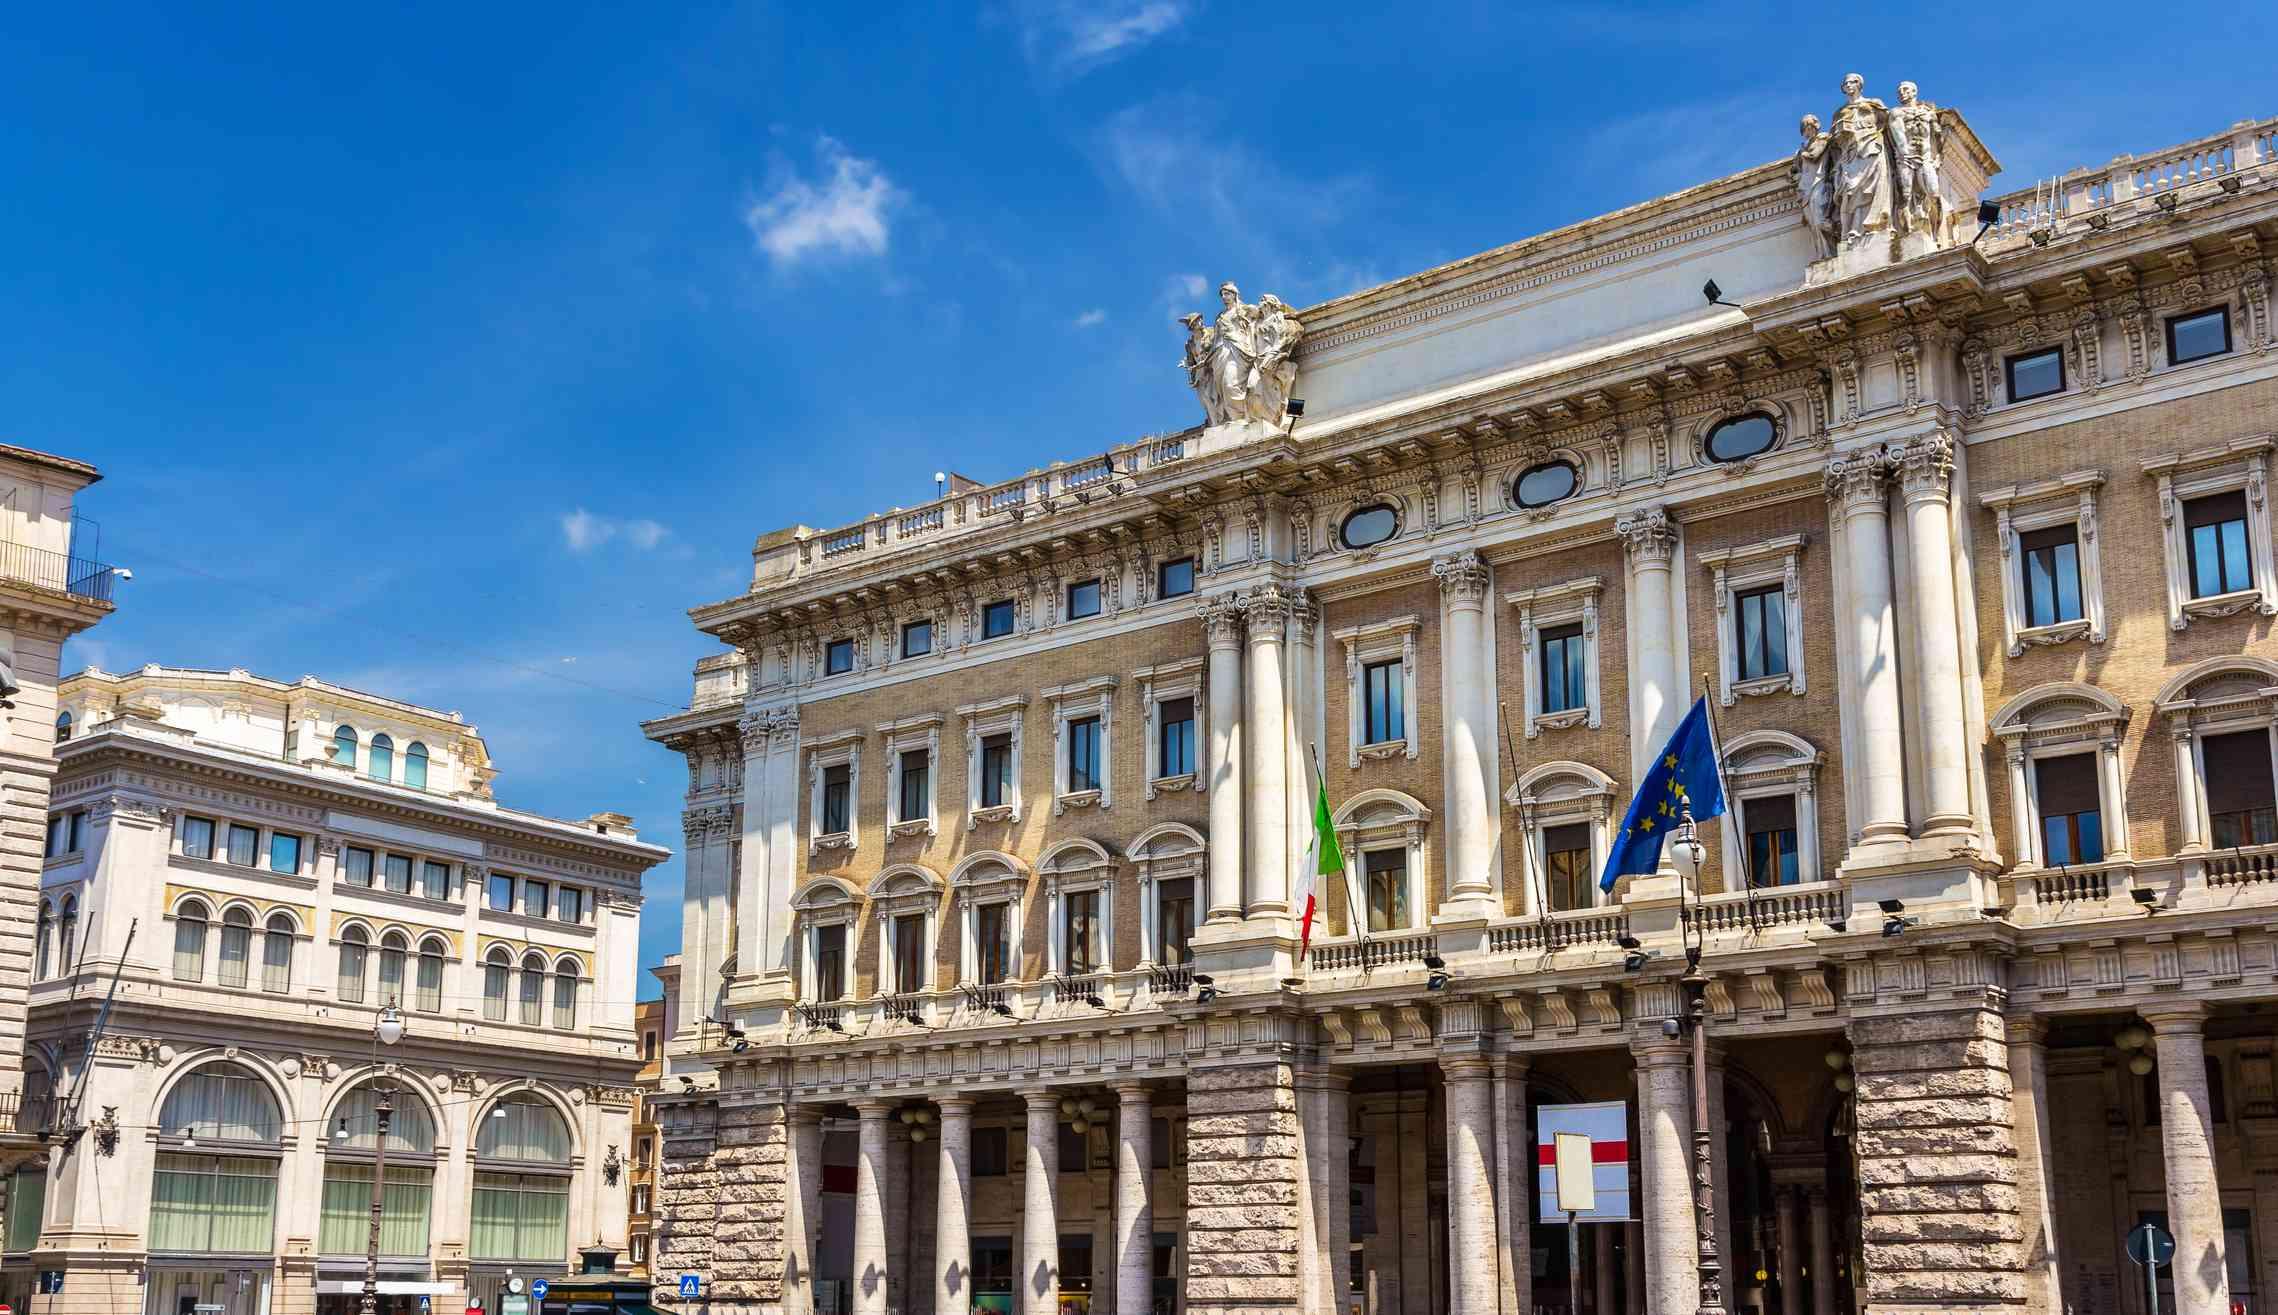 Galleria Alberto Sordi in Rome